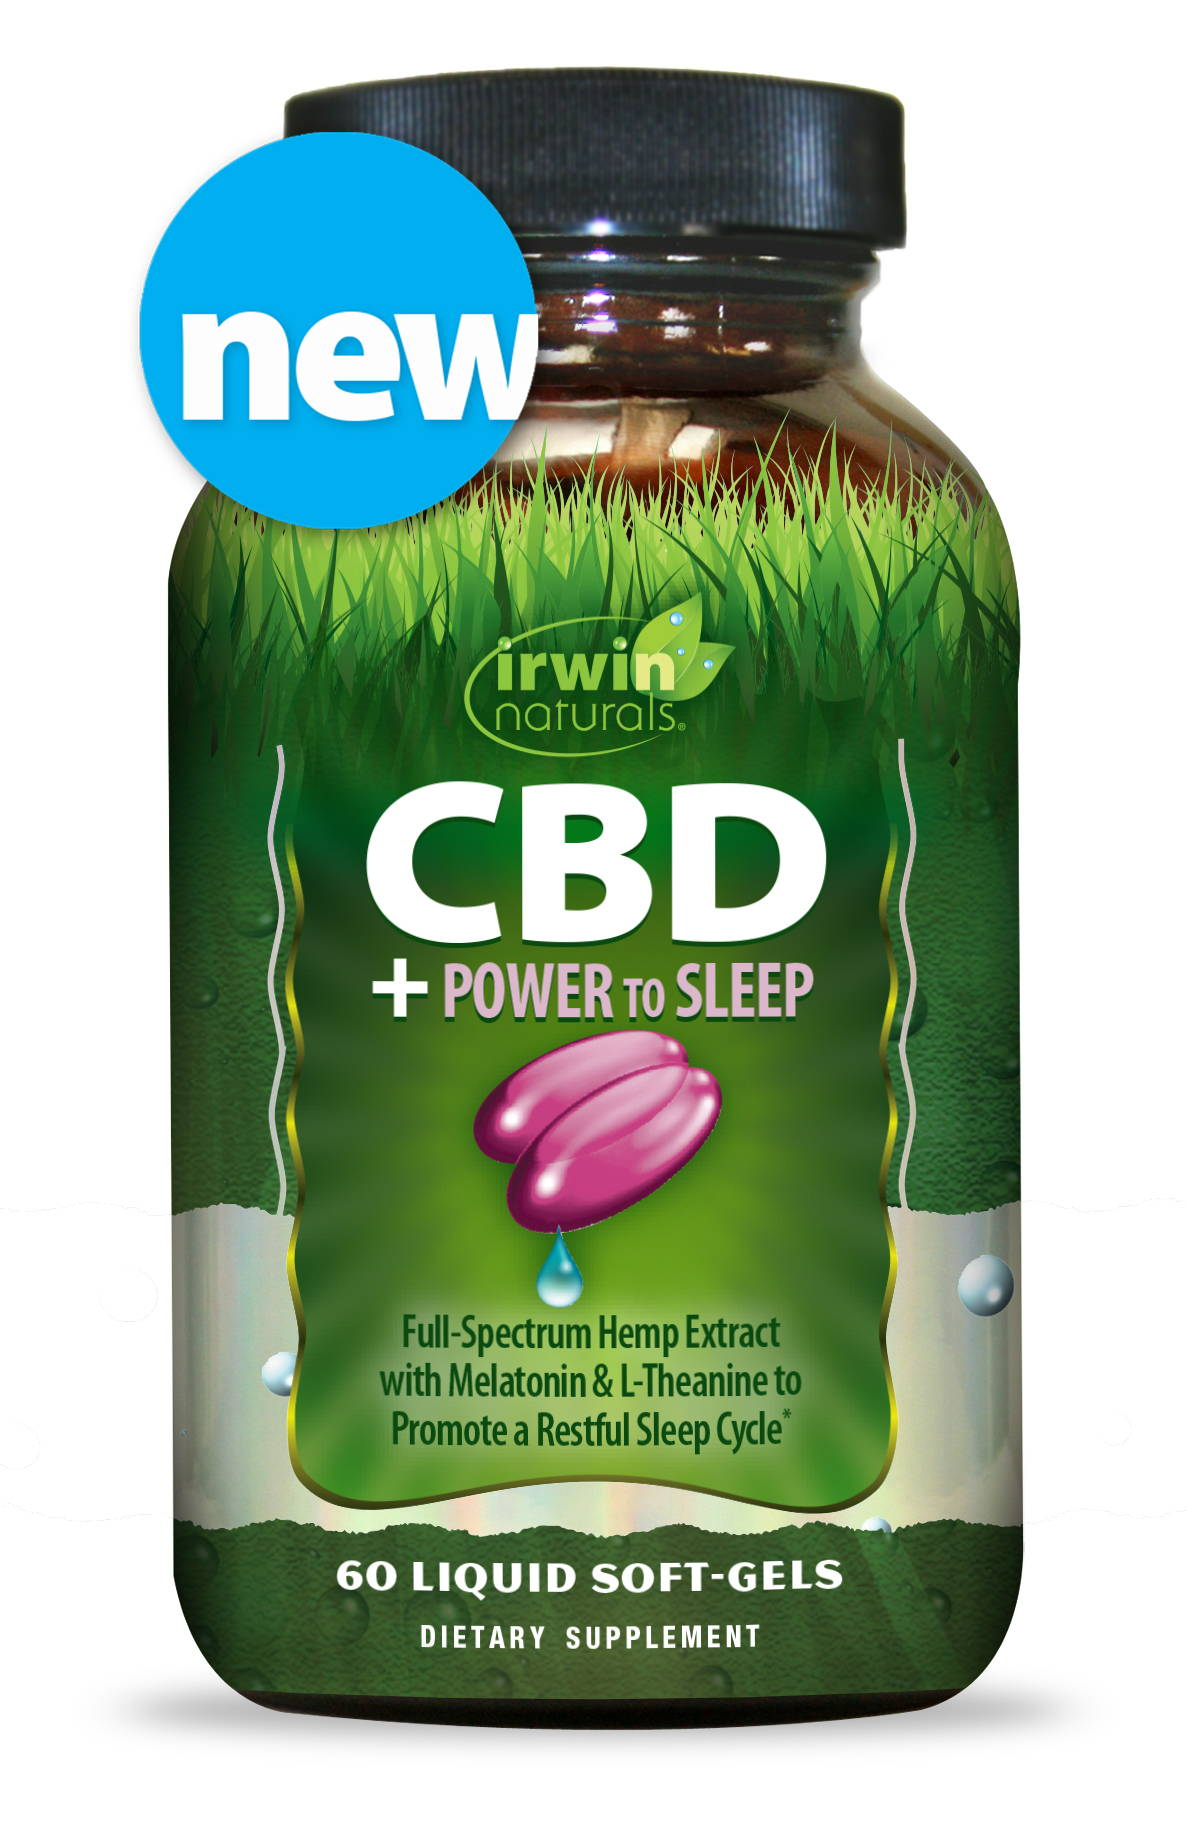 Irwin Naturals | Get Free CBD 2